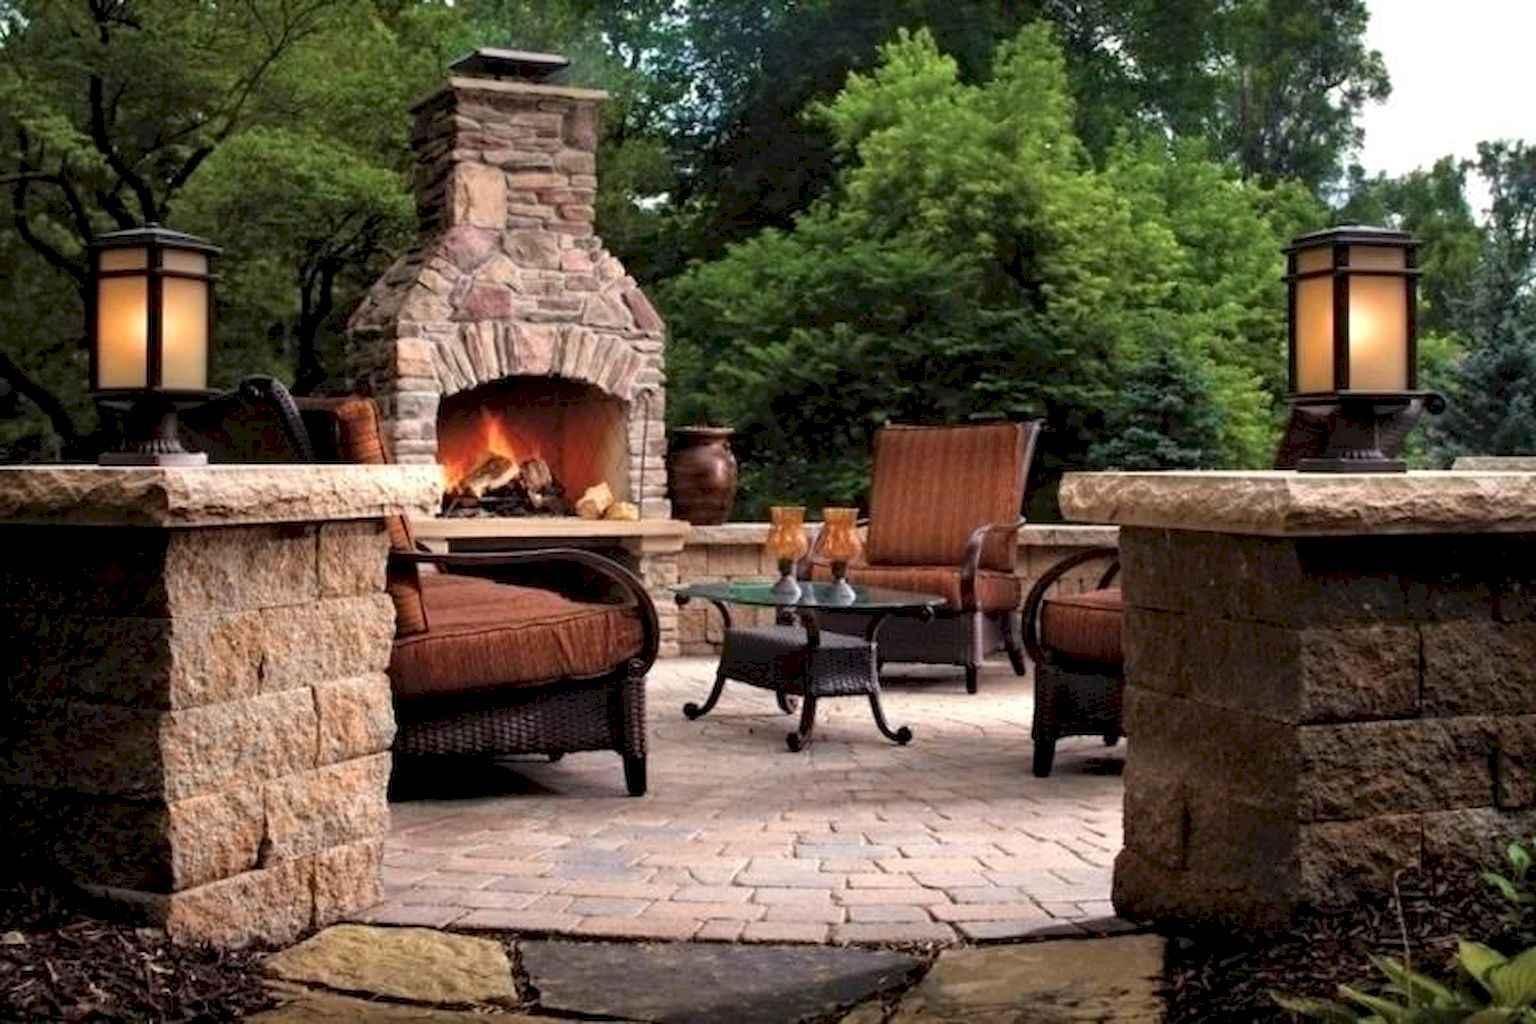 60 Beautiful Backyard Fire Pit Ideas Decoration and Remodel (26)